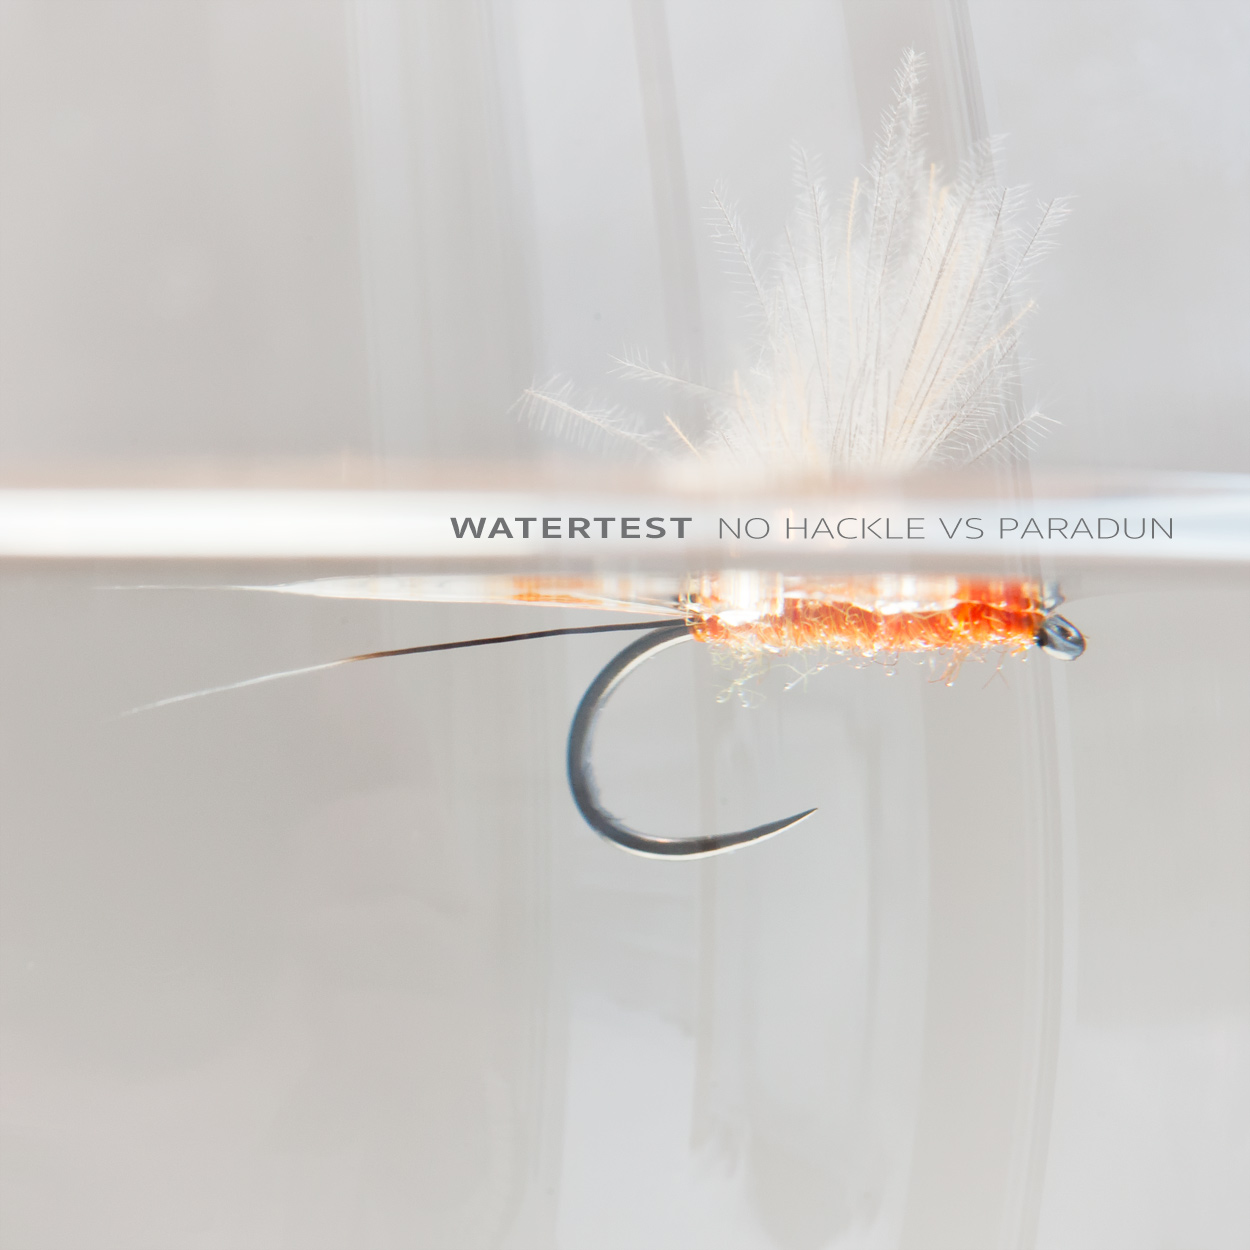 Perfect mayfly dun profile